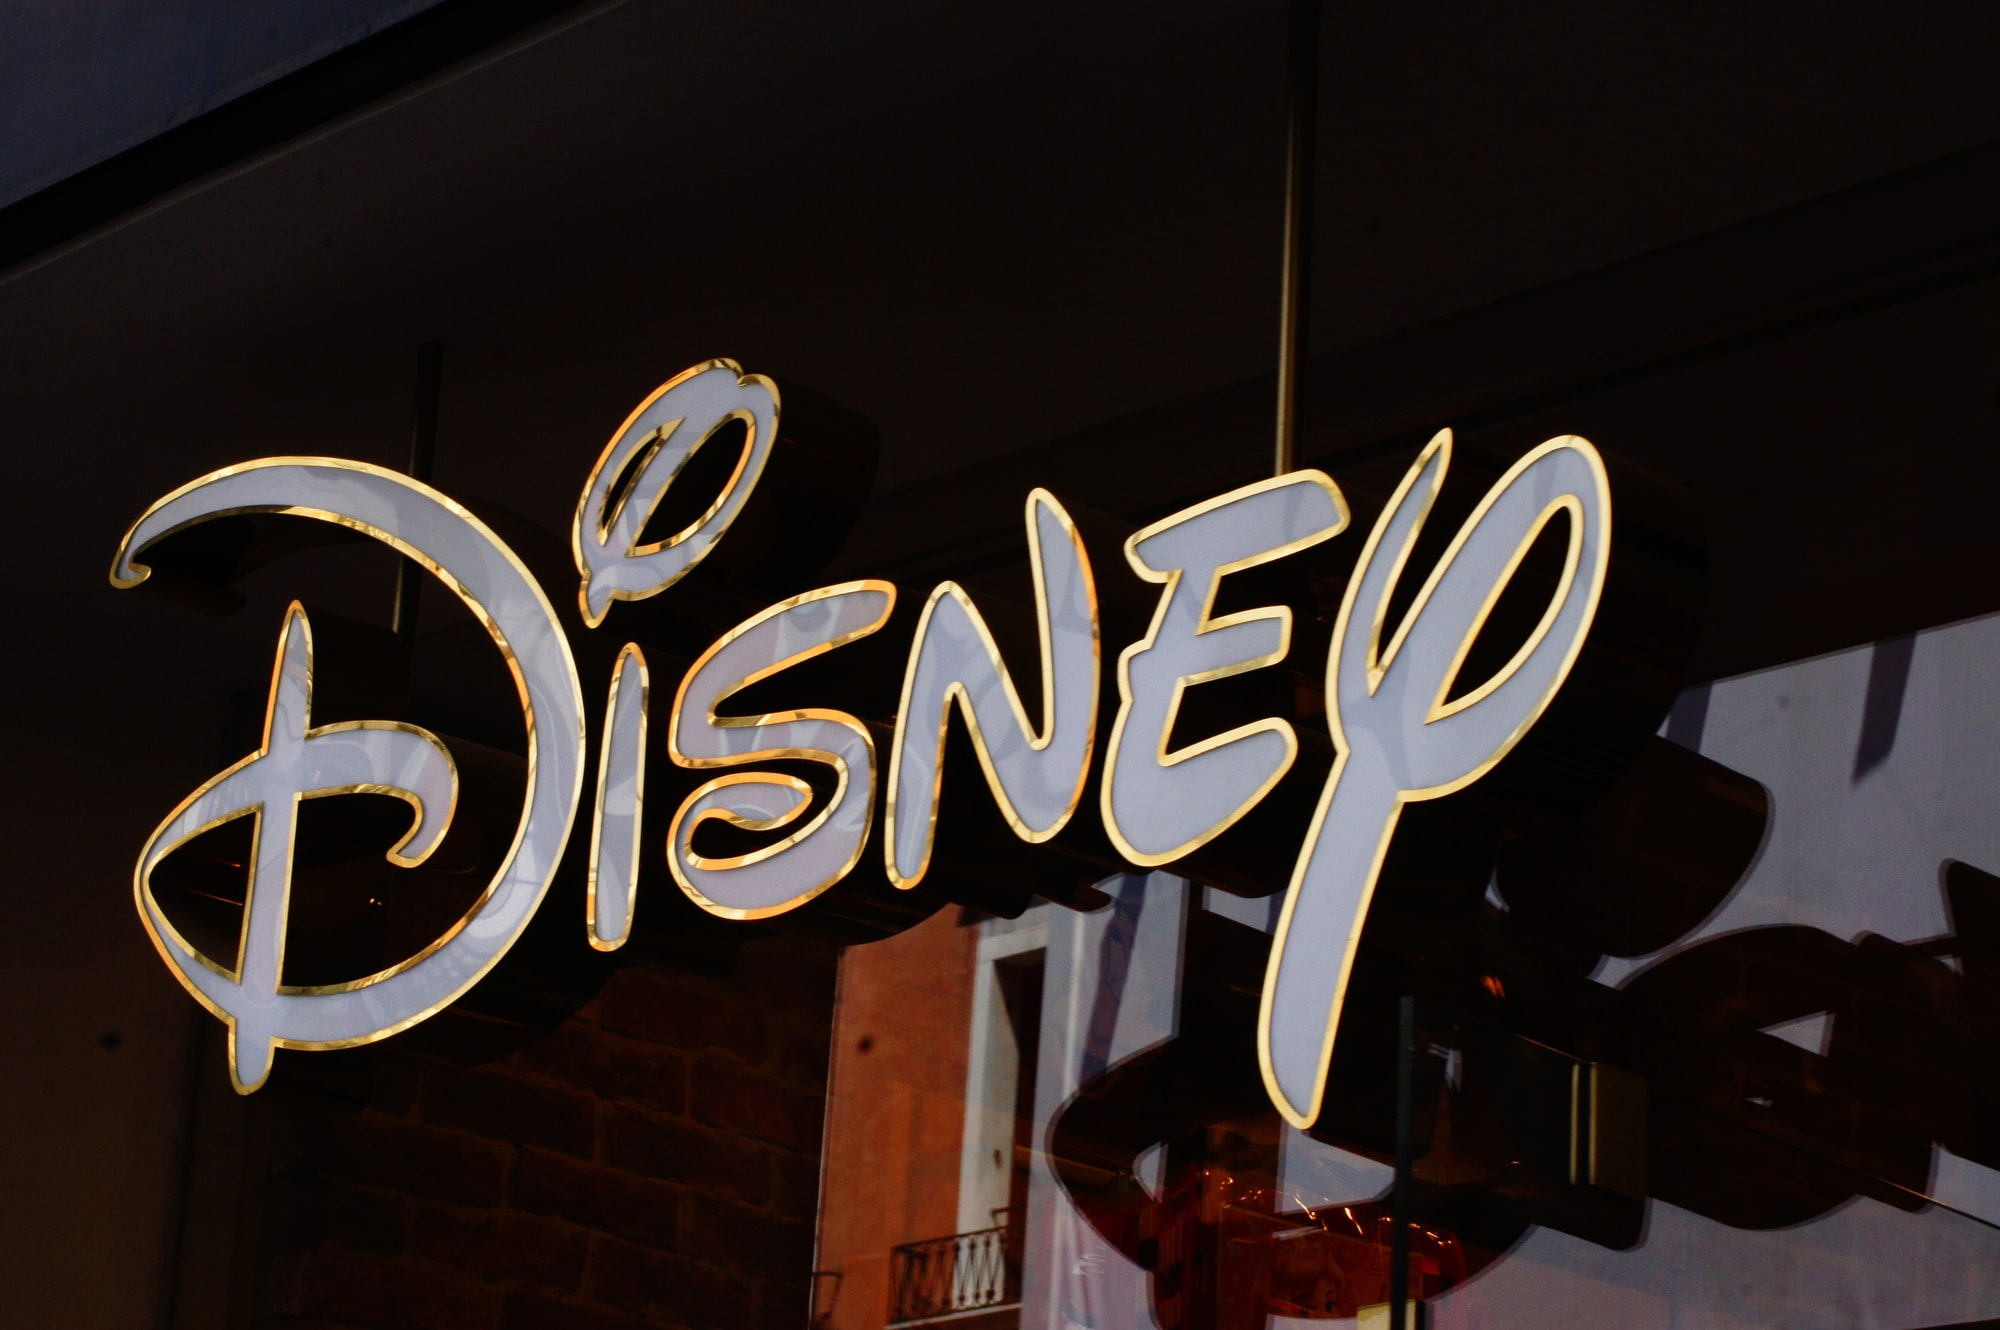 Disney покажет короткометражку перед мультфильмом «Райя и последний дракон»